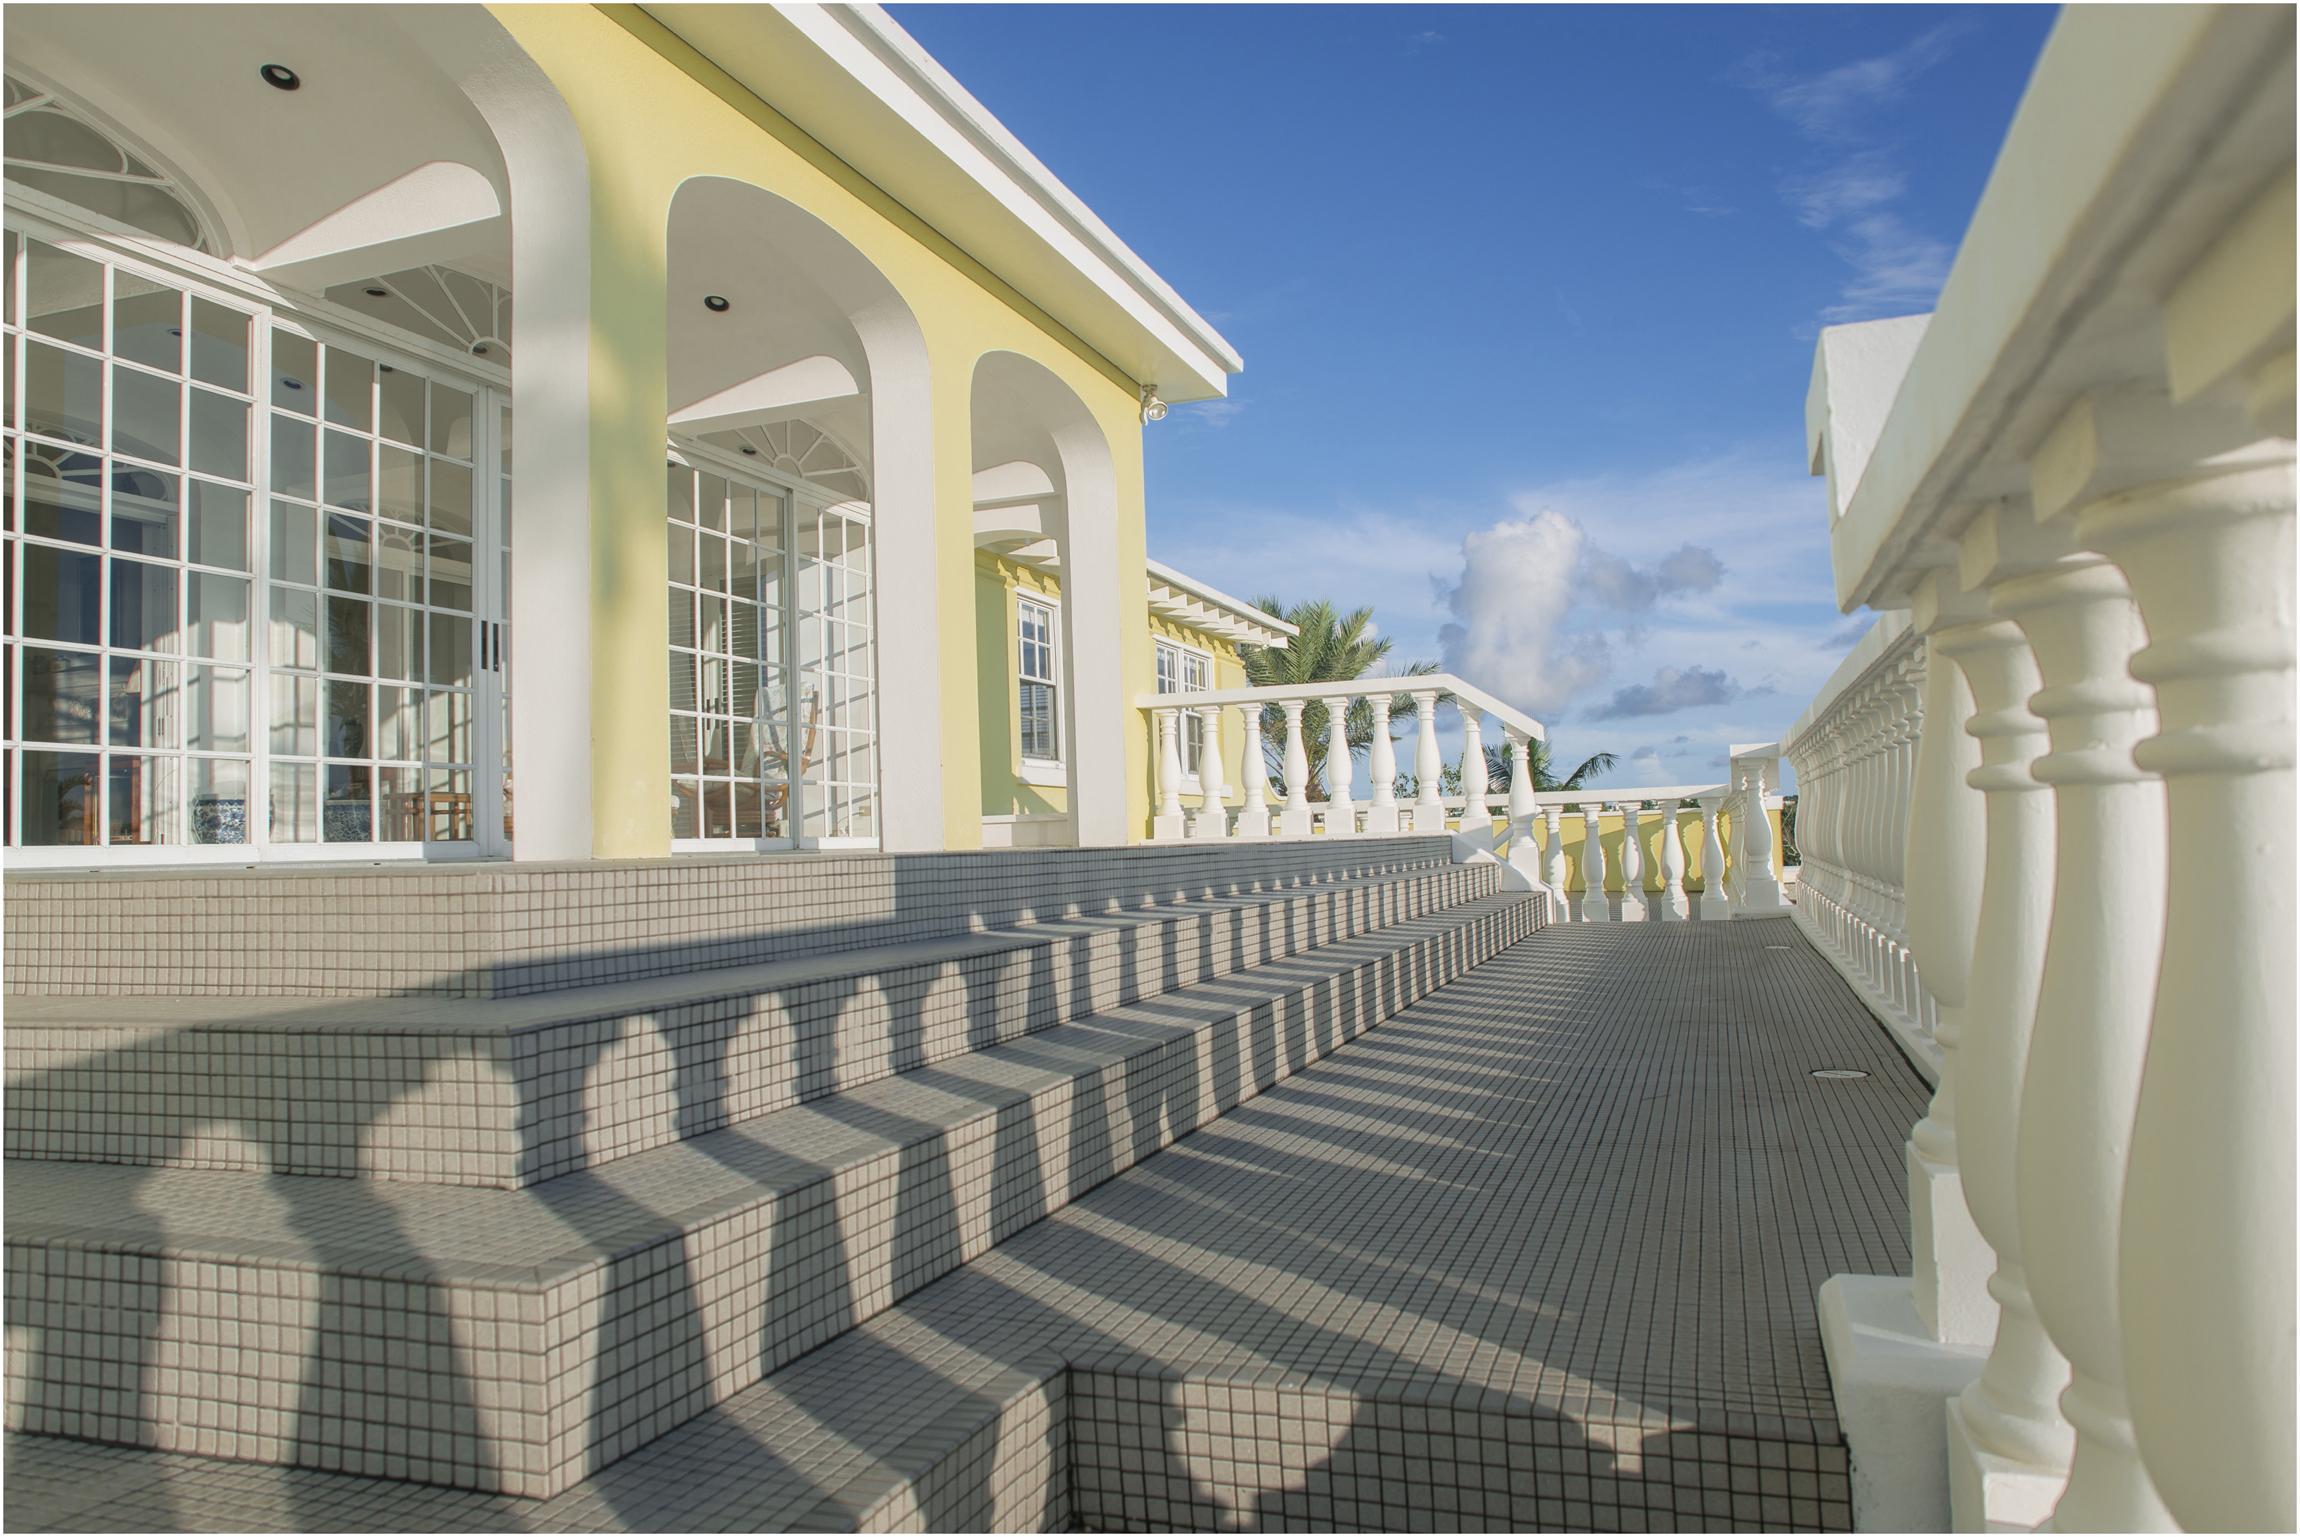 ©FianderFoto_Architecture_Bermuda_Palomera_012.jpg